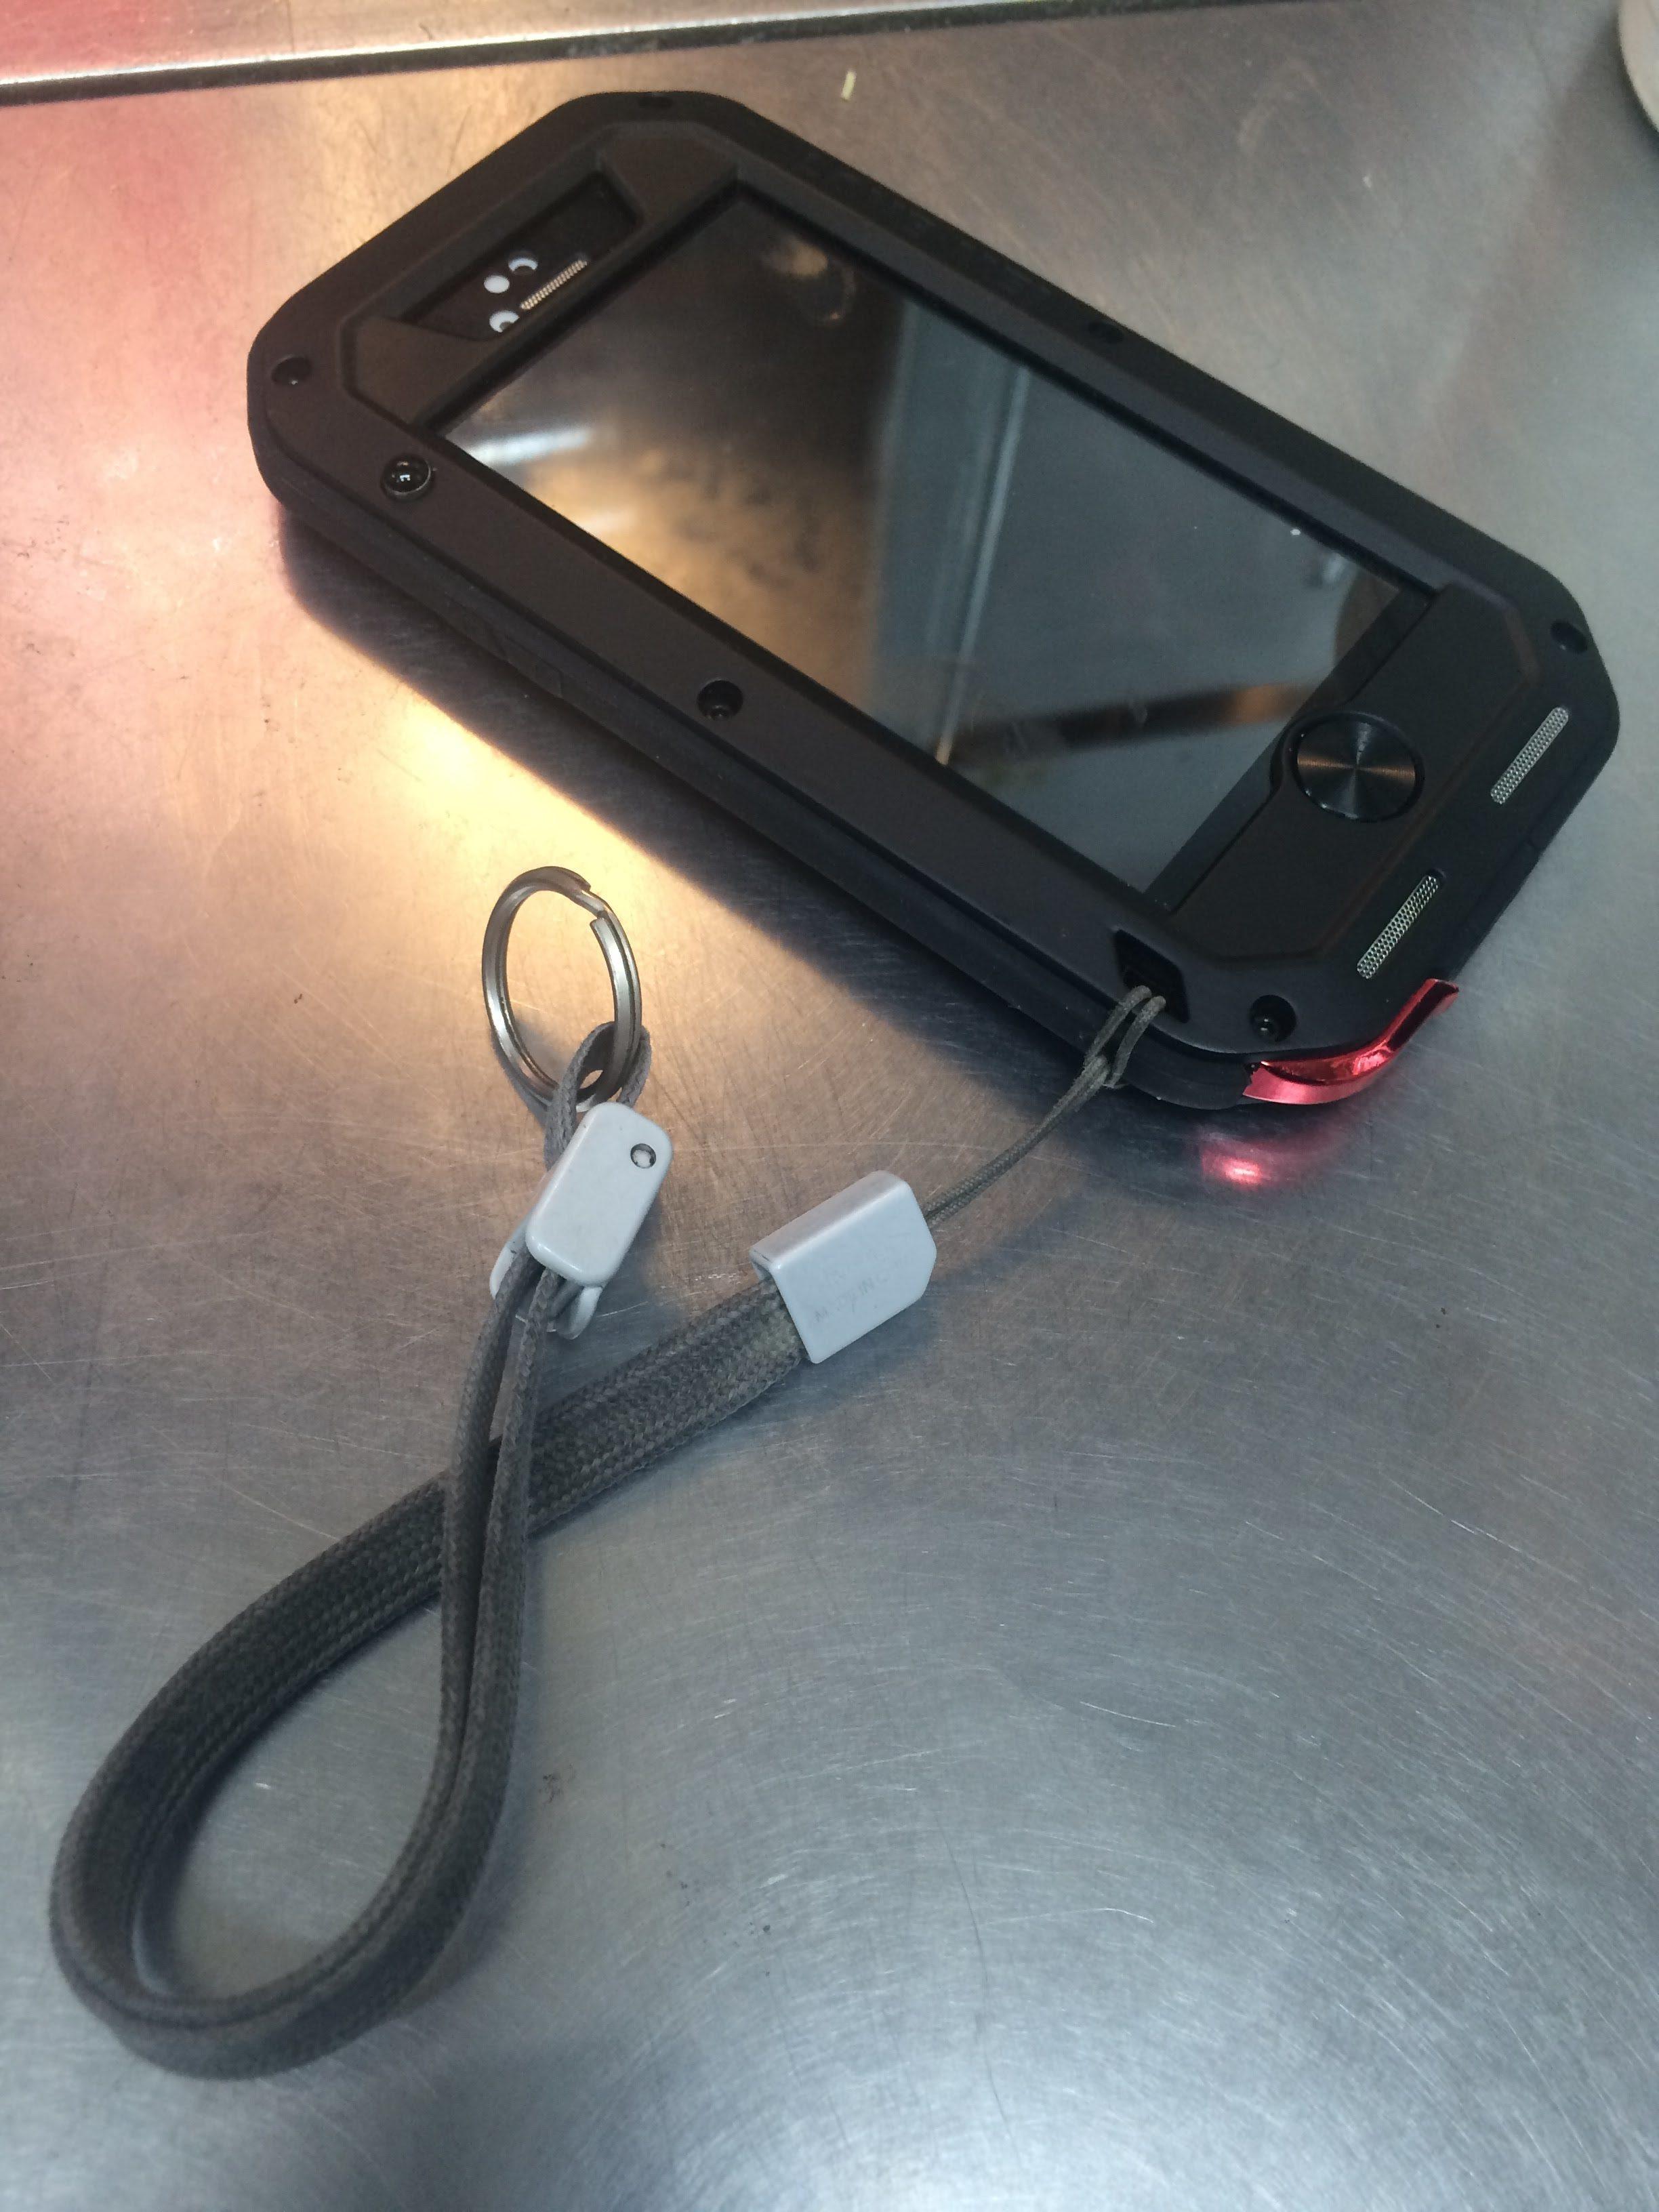 Amazonで買ったLOVE MEIの iPhone 5Sケースが意外にイケるパチモンだった件